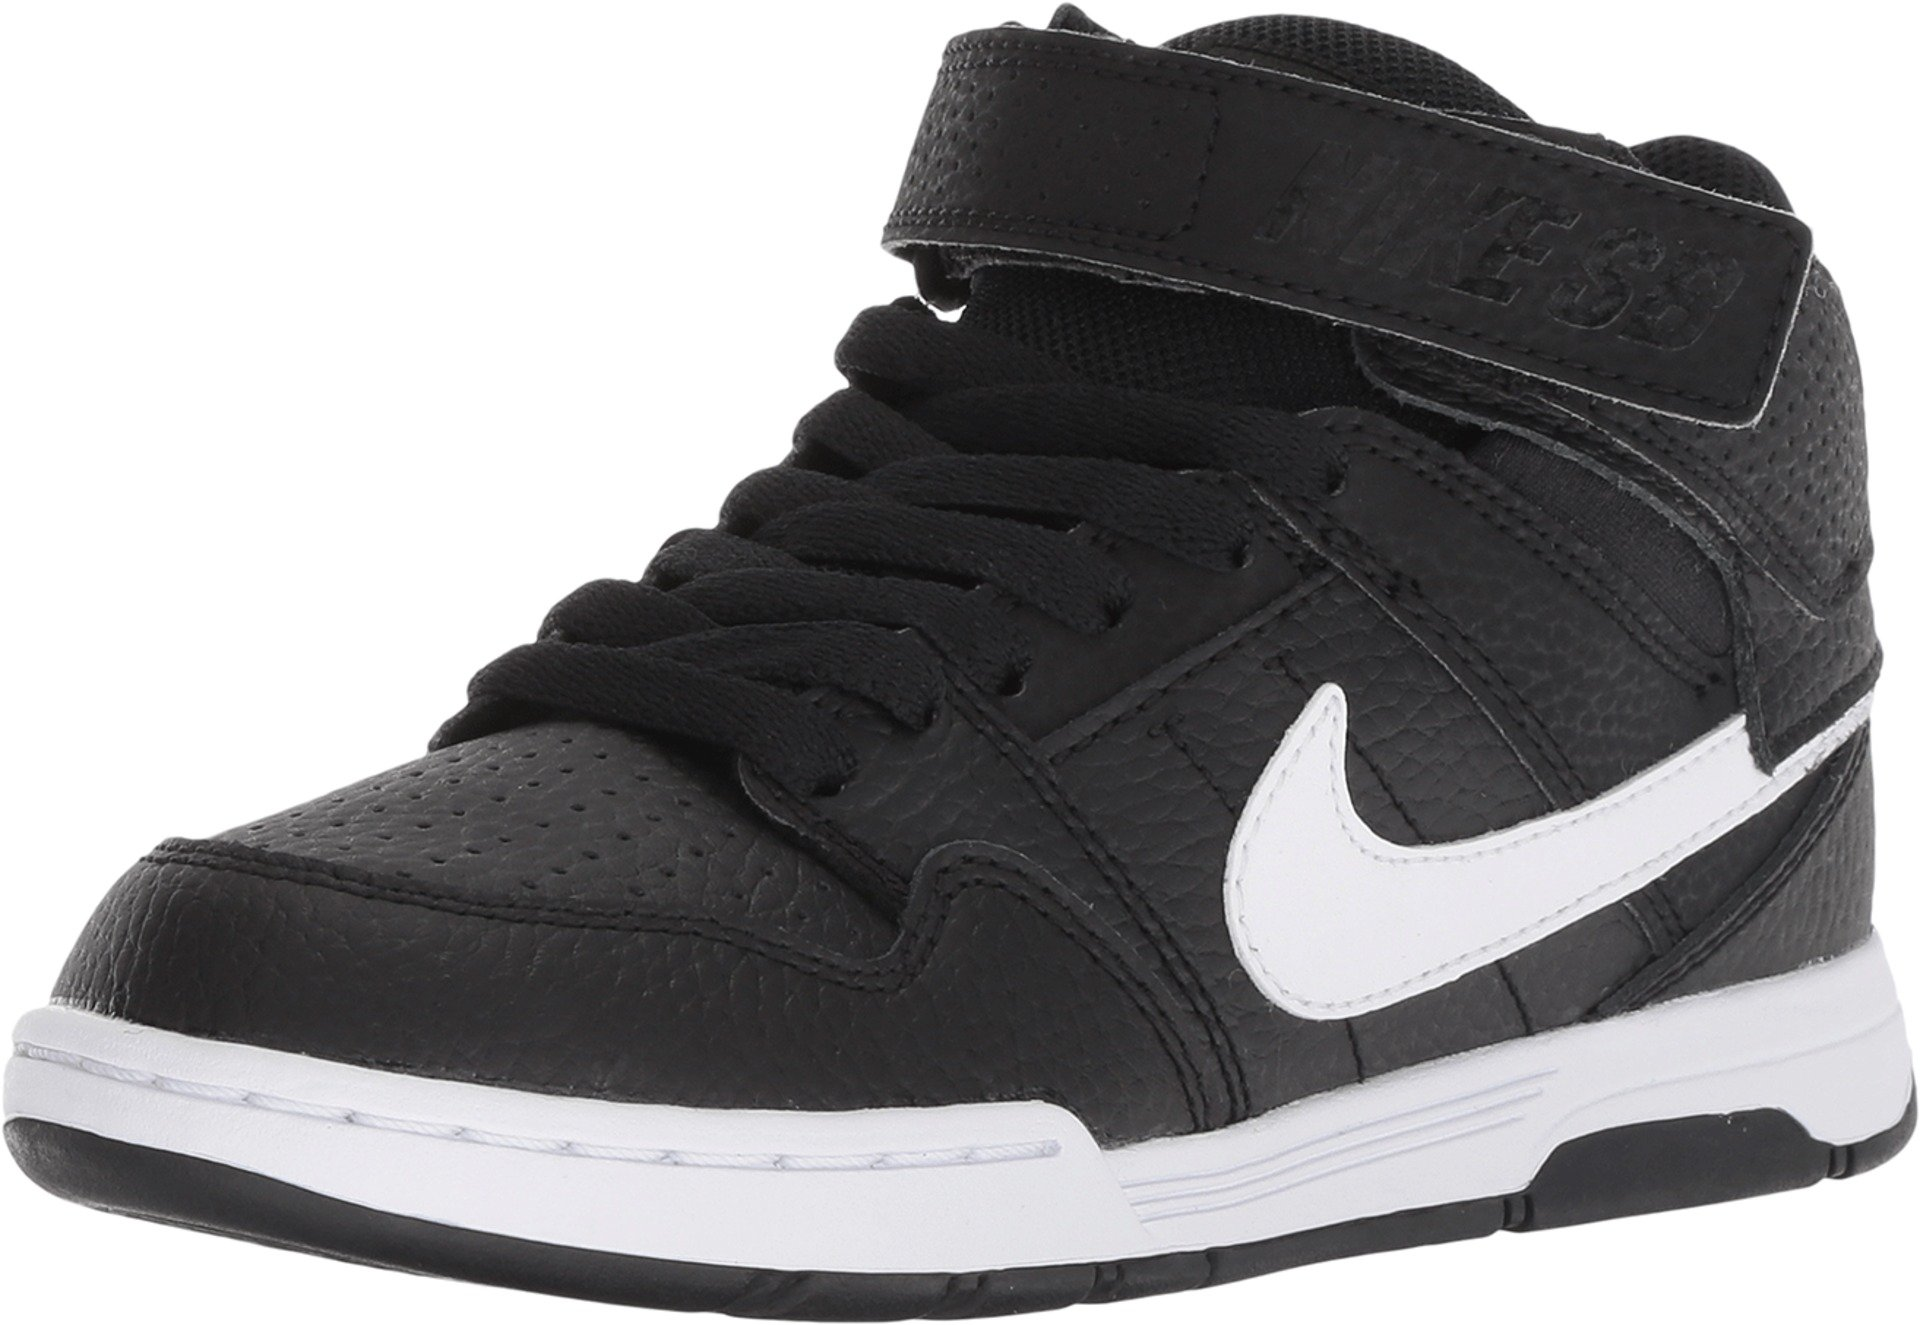 Nike Boys' Mogan Mid 2 JR Skate Shoe, Black/White, 10.5 M US Little Kid